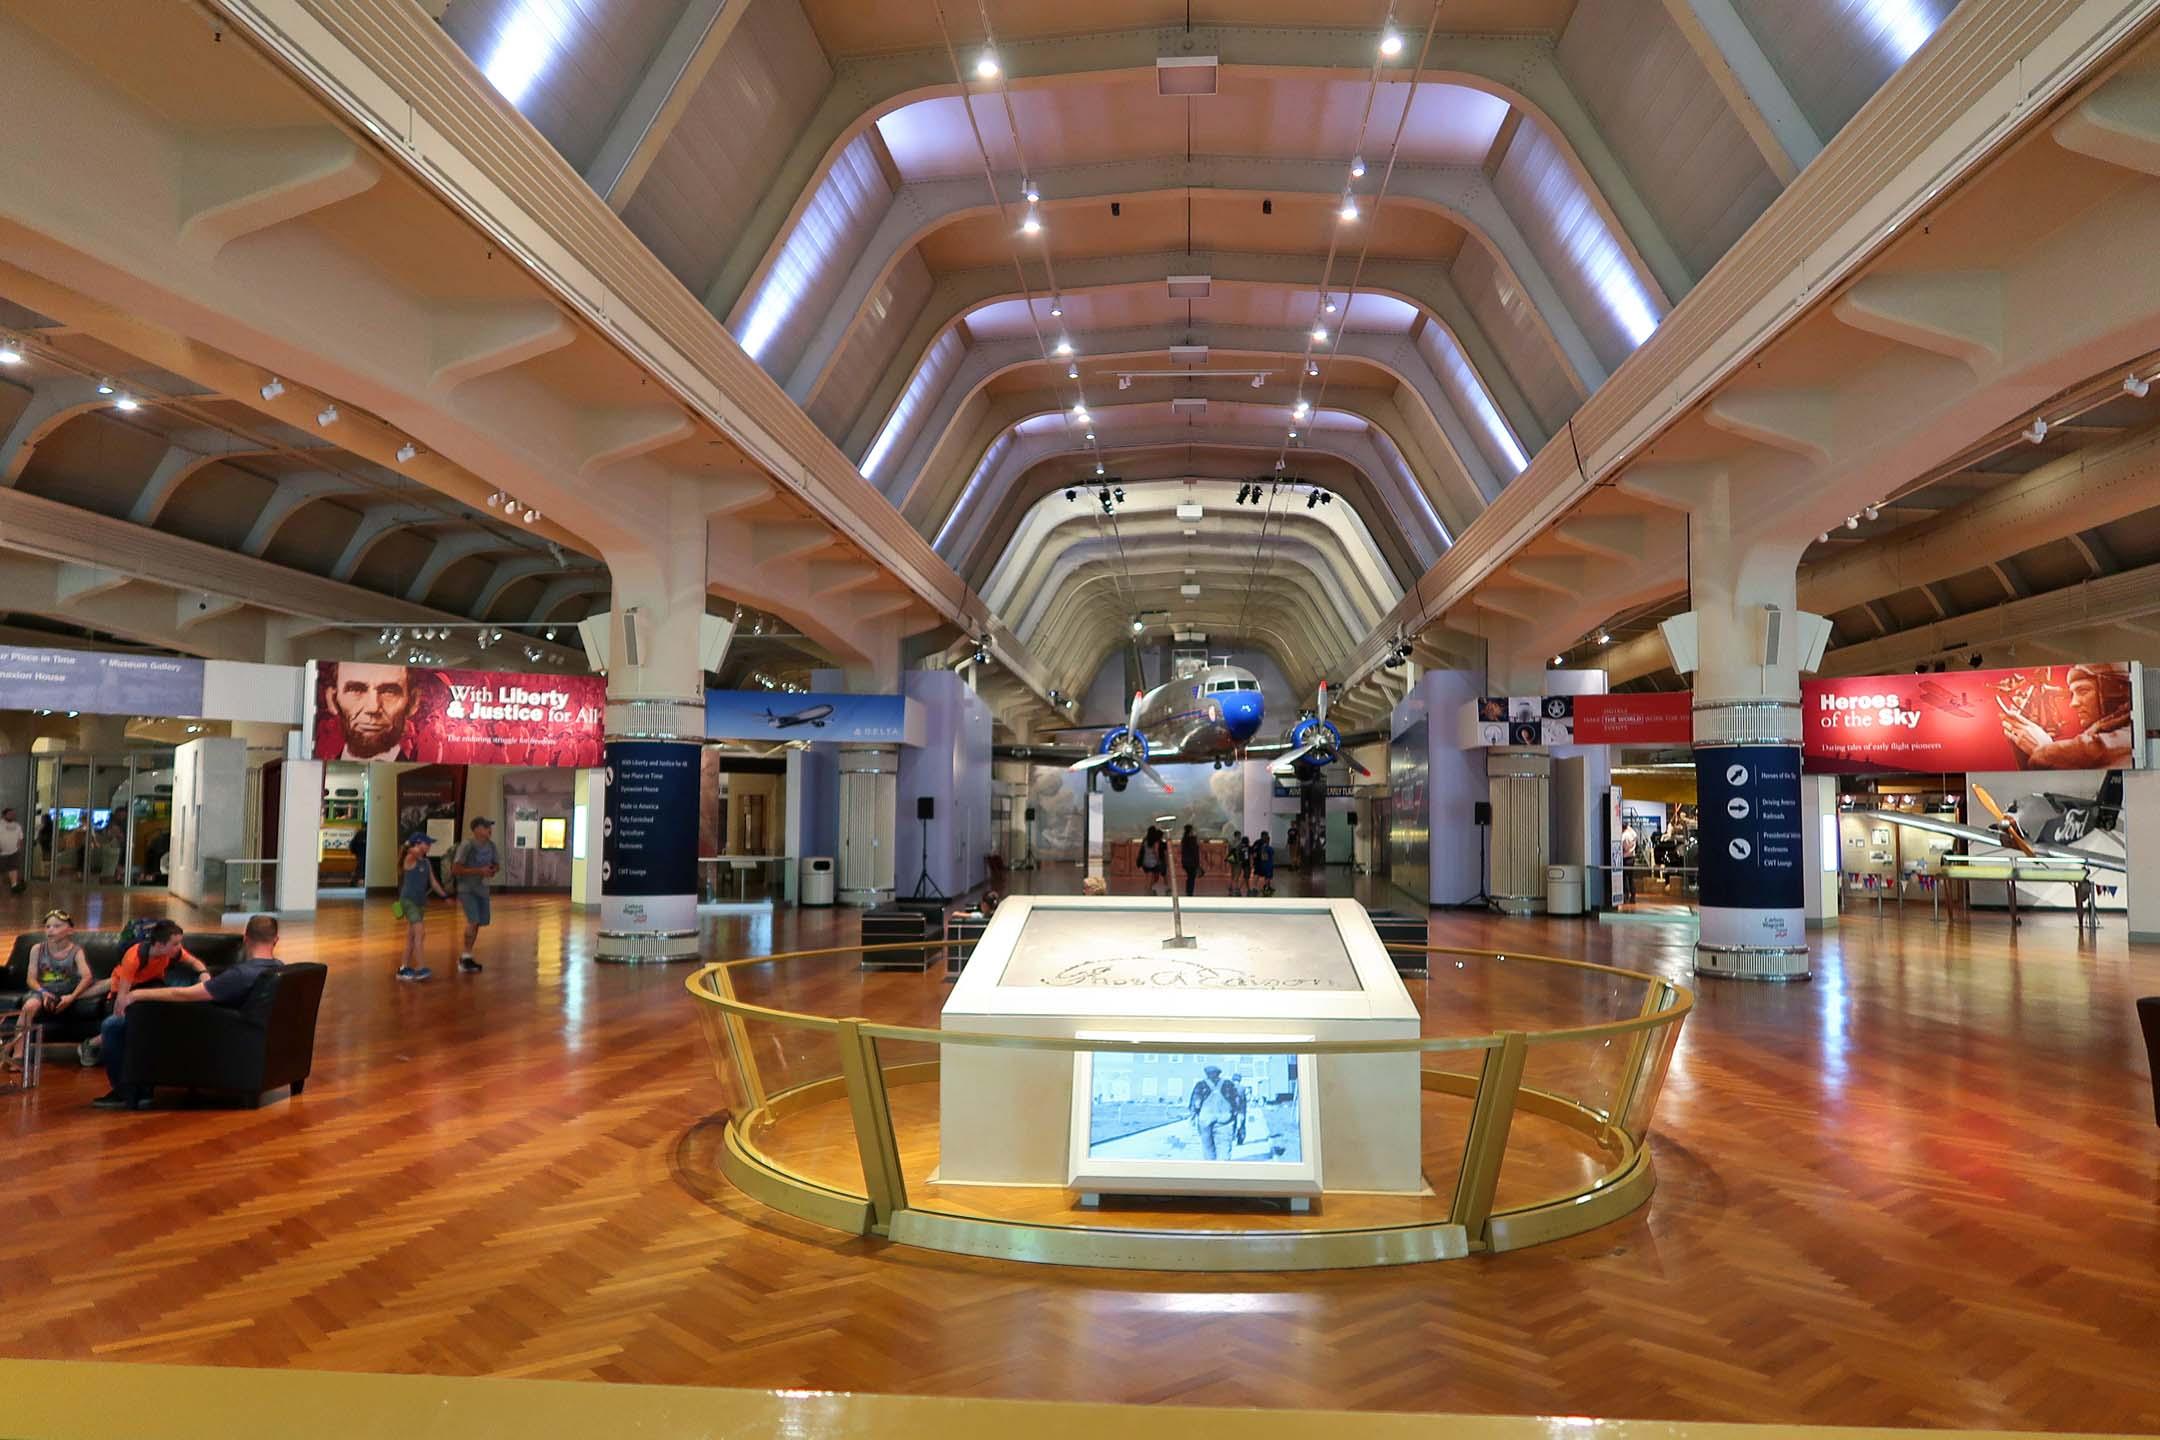 One of the museum's main hallways